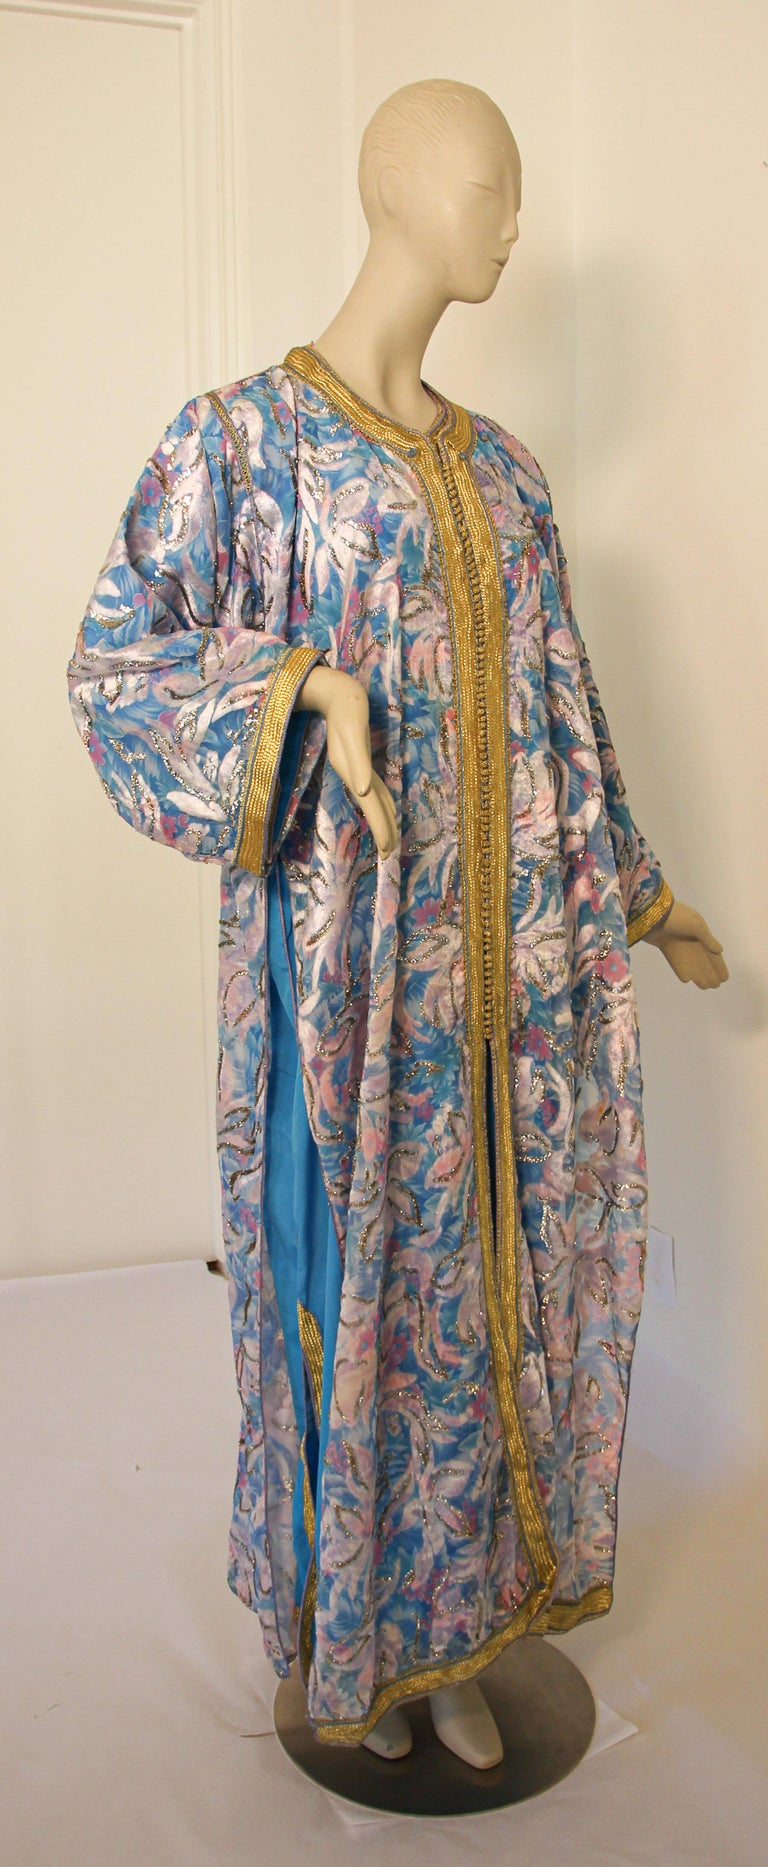 Moorish Moroccan Kaftan in Turquoise and Gold Floral Brocade Metallic Lame For Sale